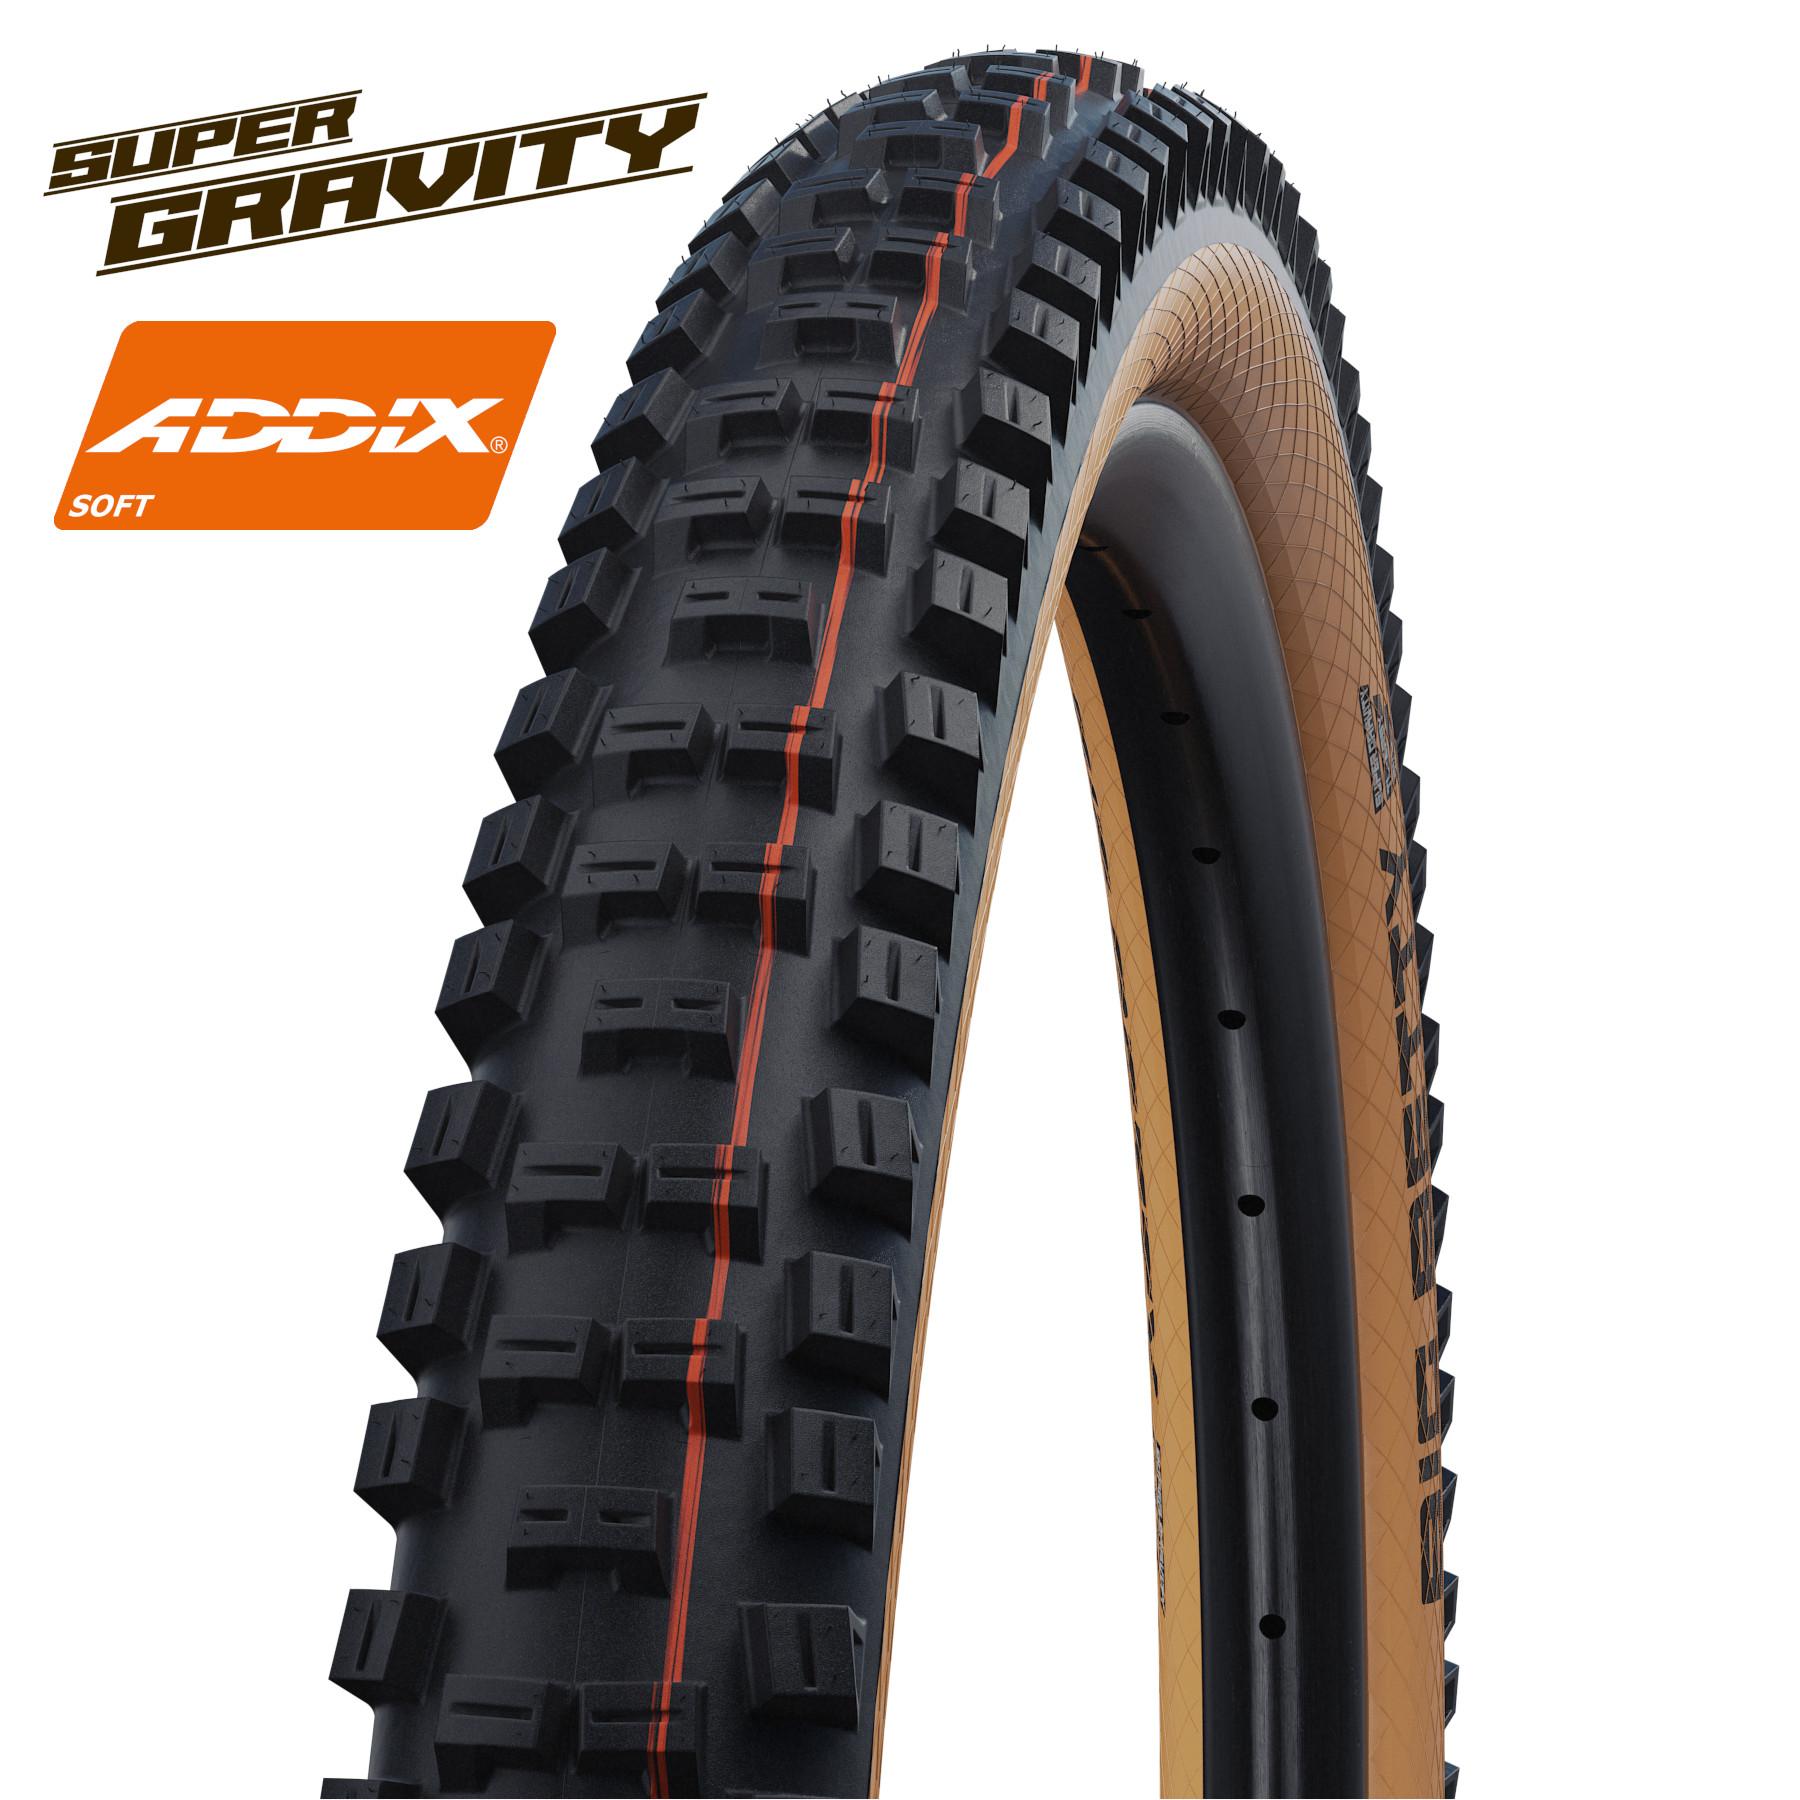 Picture of Schwalbe Big Betty Evolution MTB Folding Tire - AddixSoft - SuperGravity - TLEasy - E-50 - 29x2.4 Inches - Classic-Skin